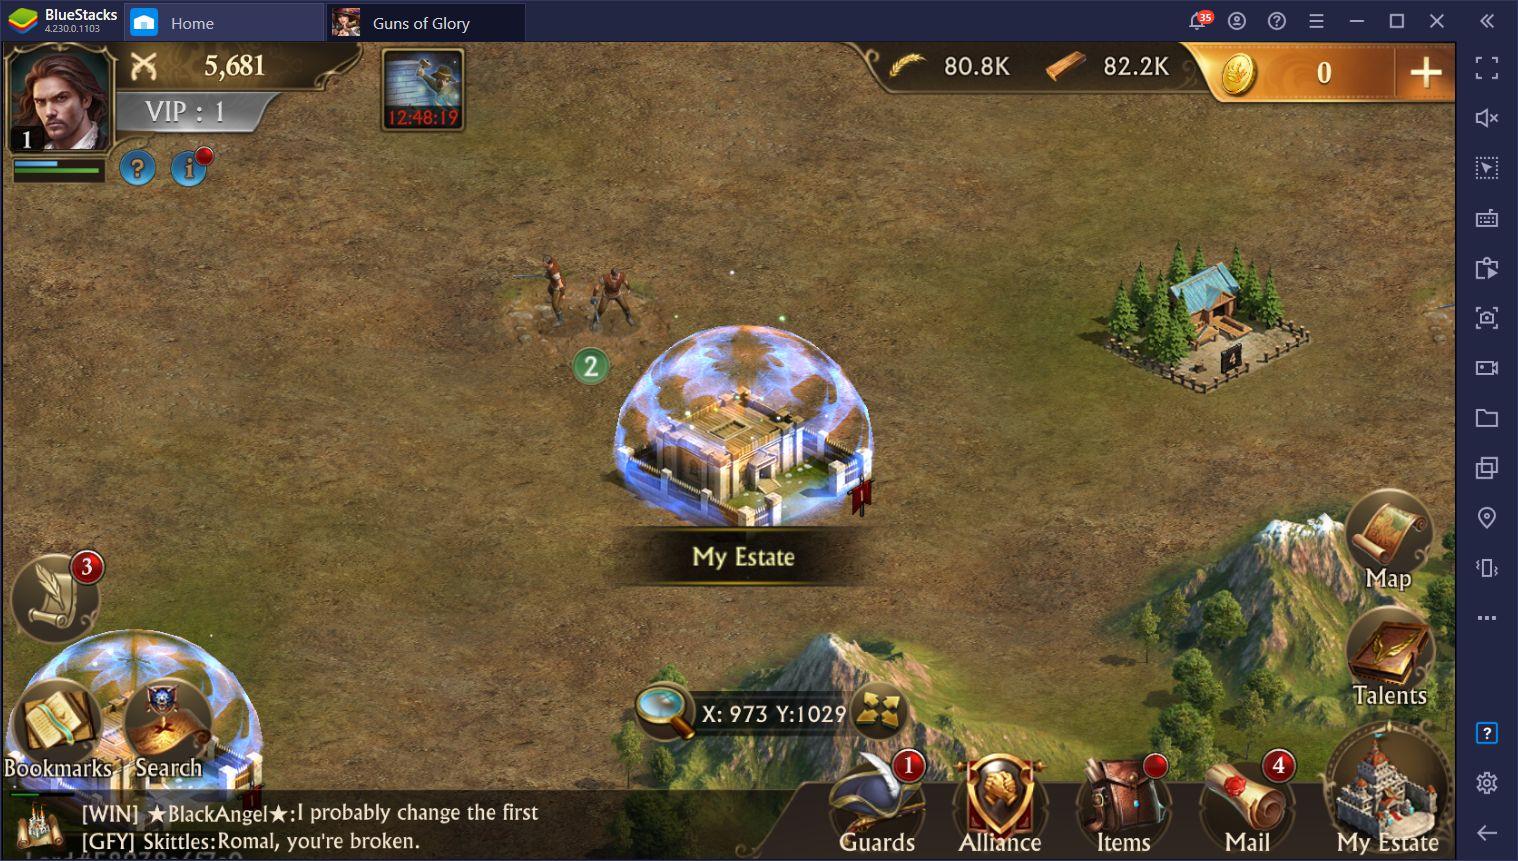 BlueStacks Eco Mode image 3